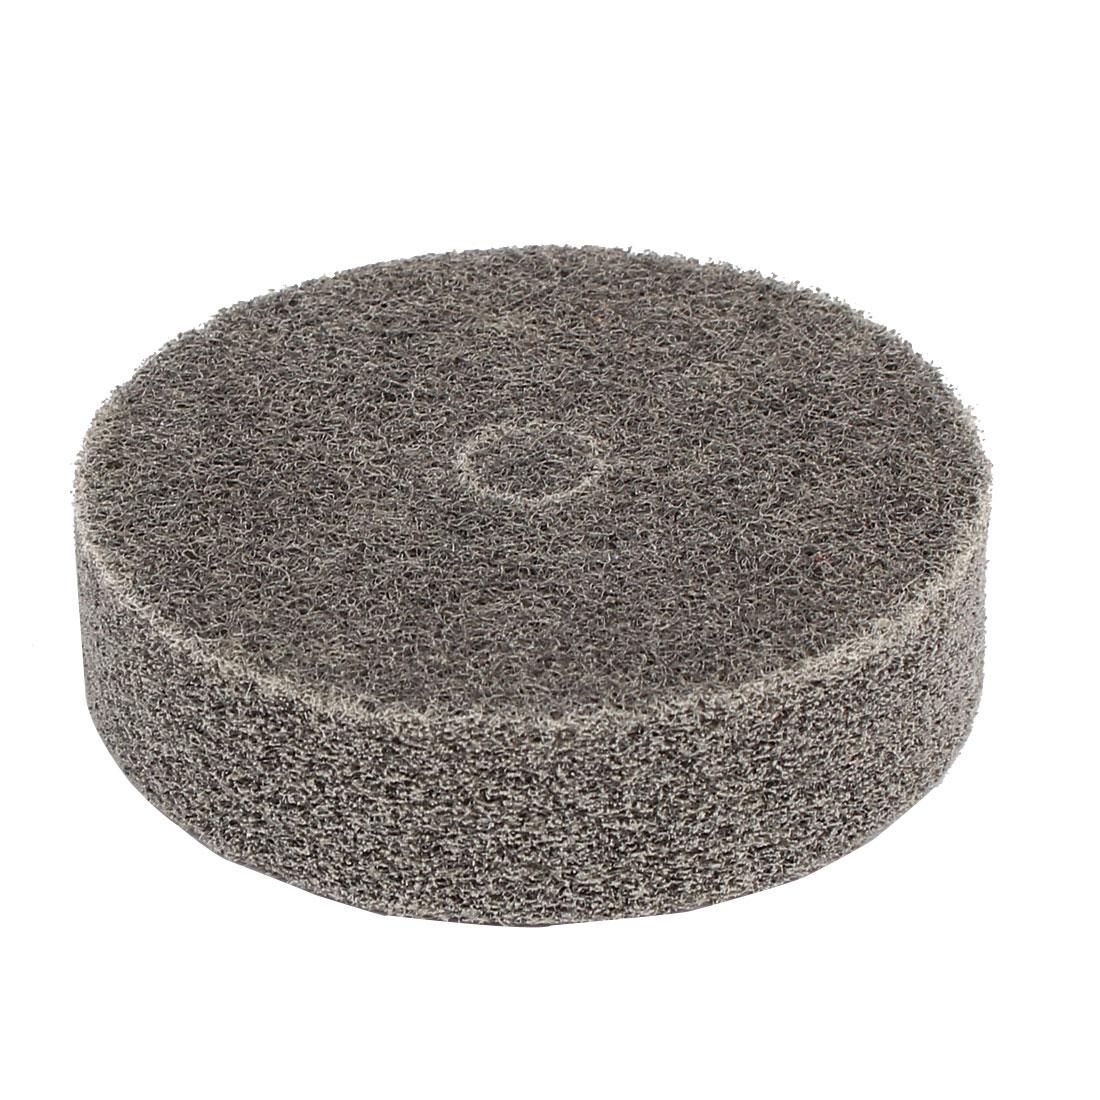 75mm Dia Cylindrical Shape Nylon Fiber Polishing Wheel Buffing Disc Gray